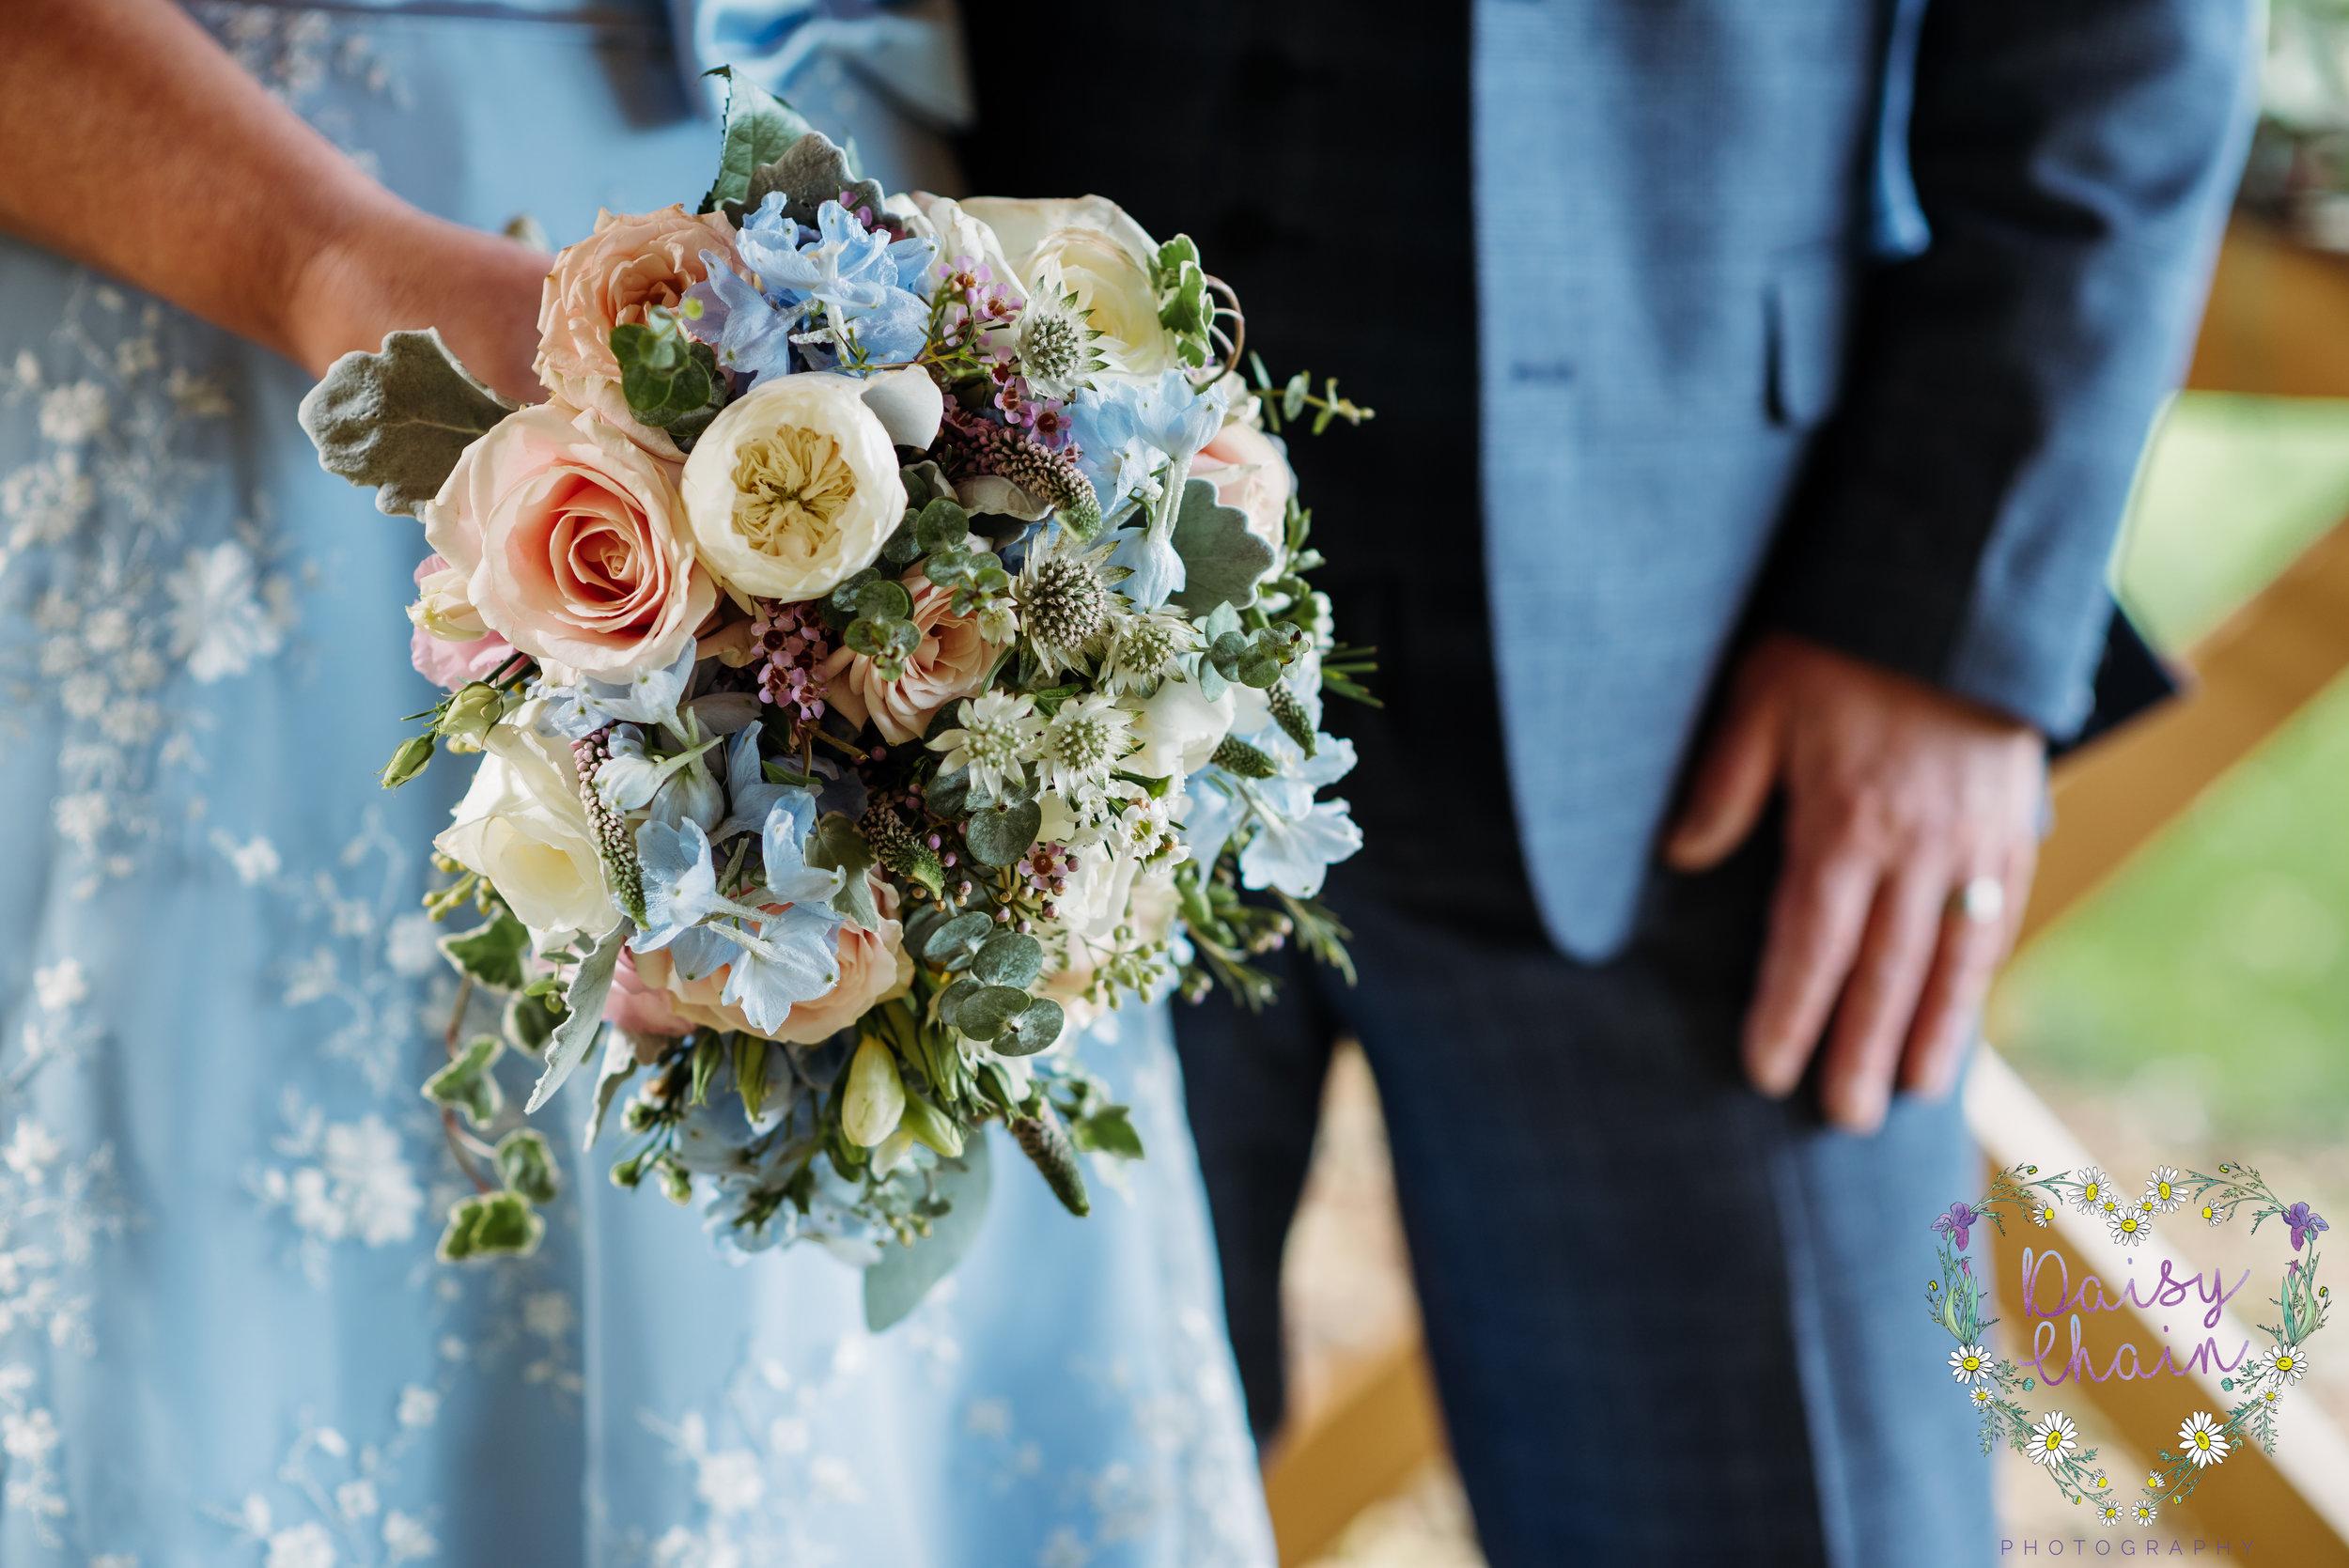 Wedding bouquet - something blue